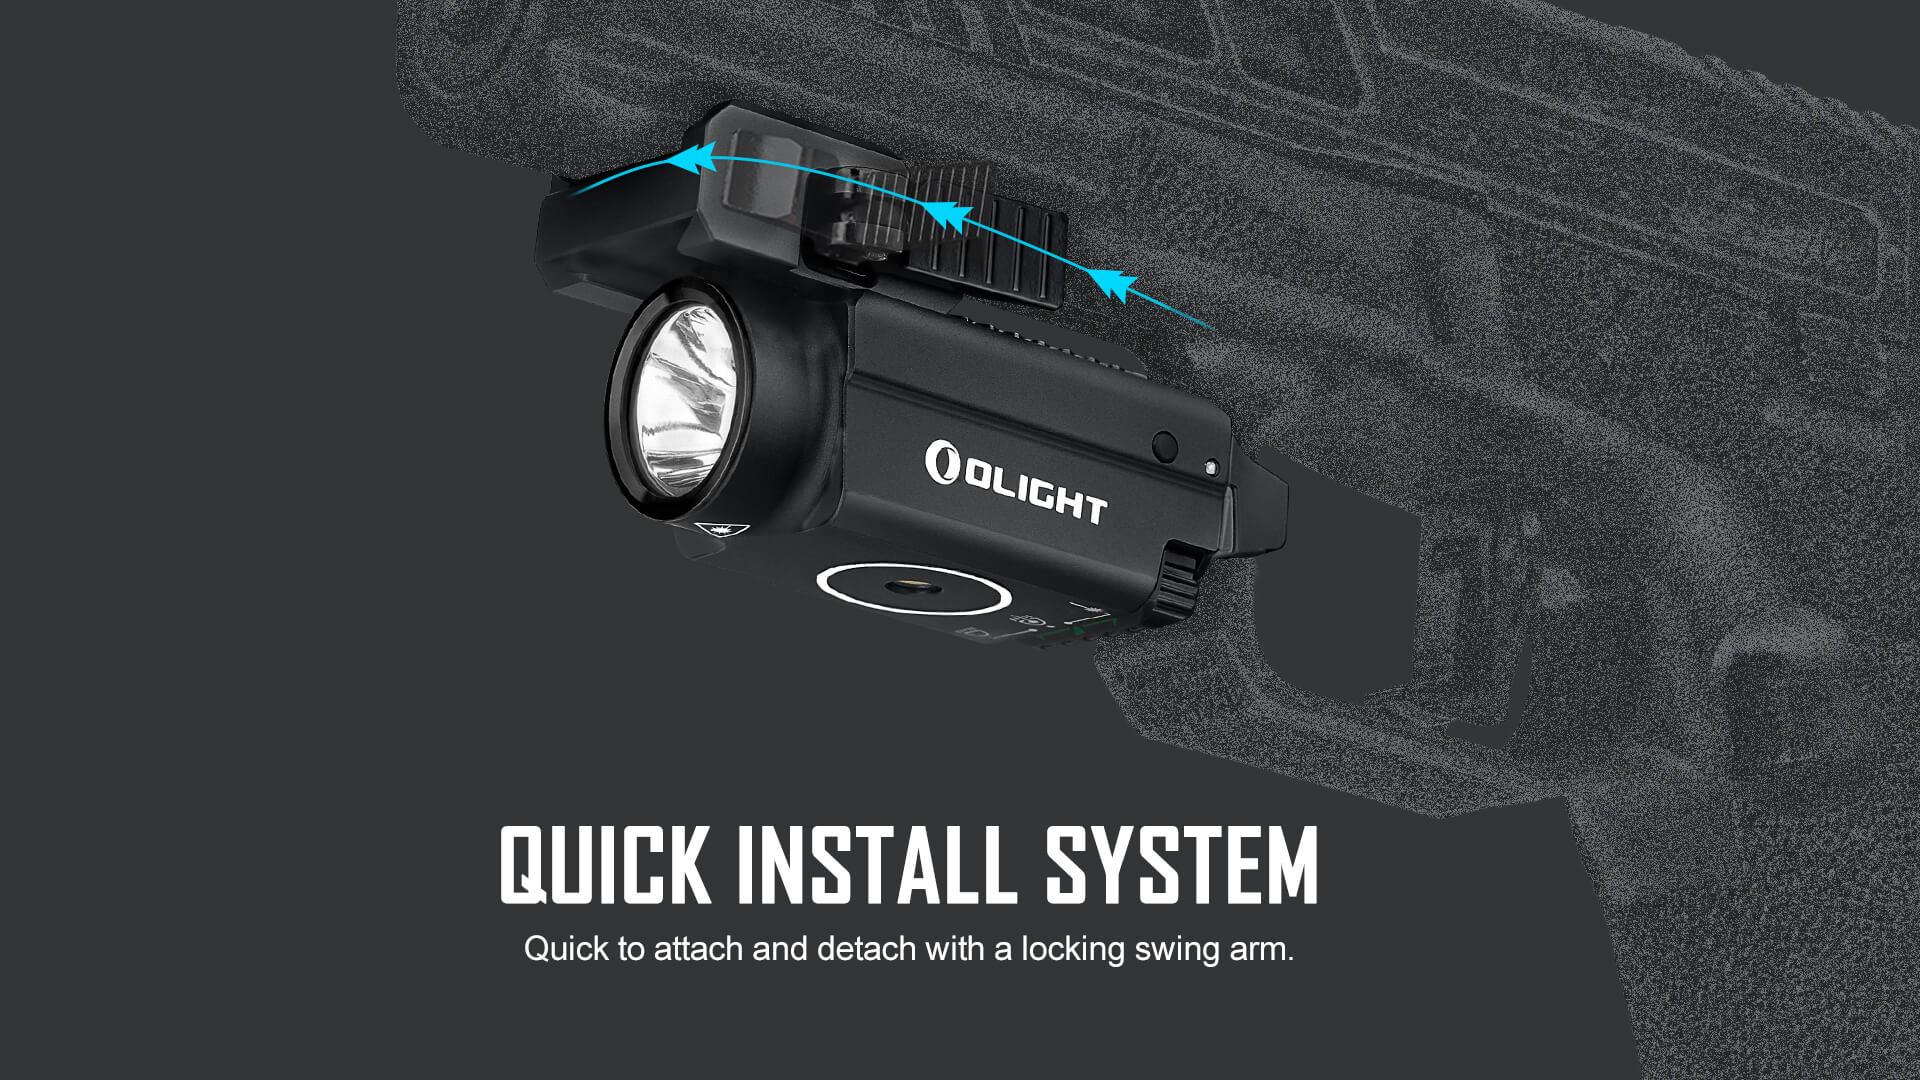 olight baldr s 800 lumen green laser light